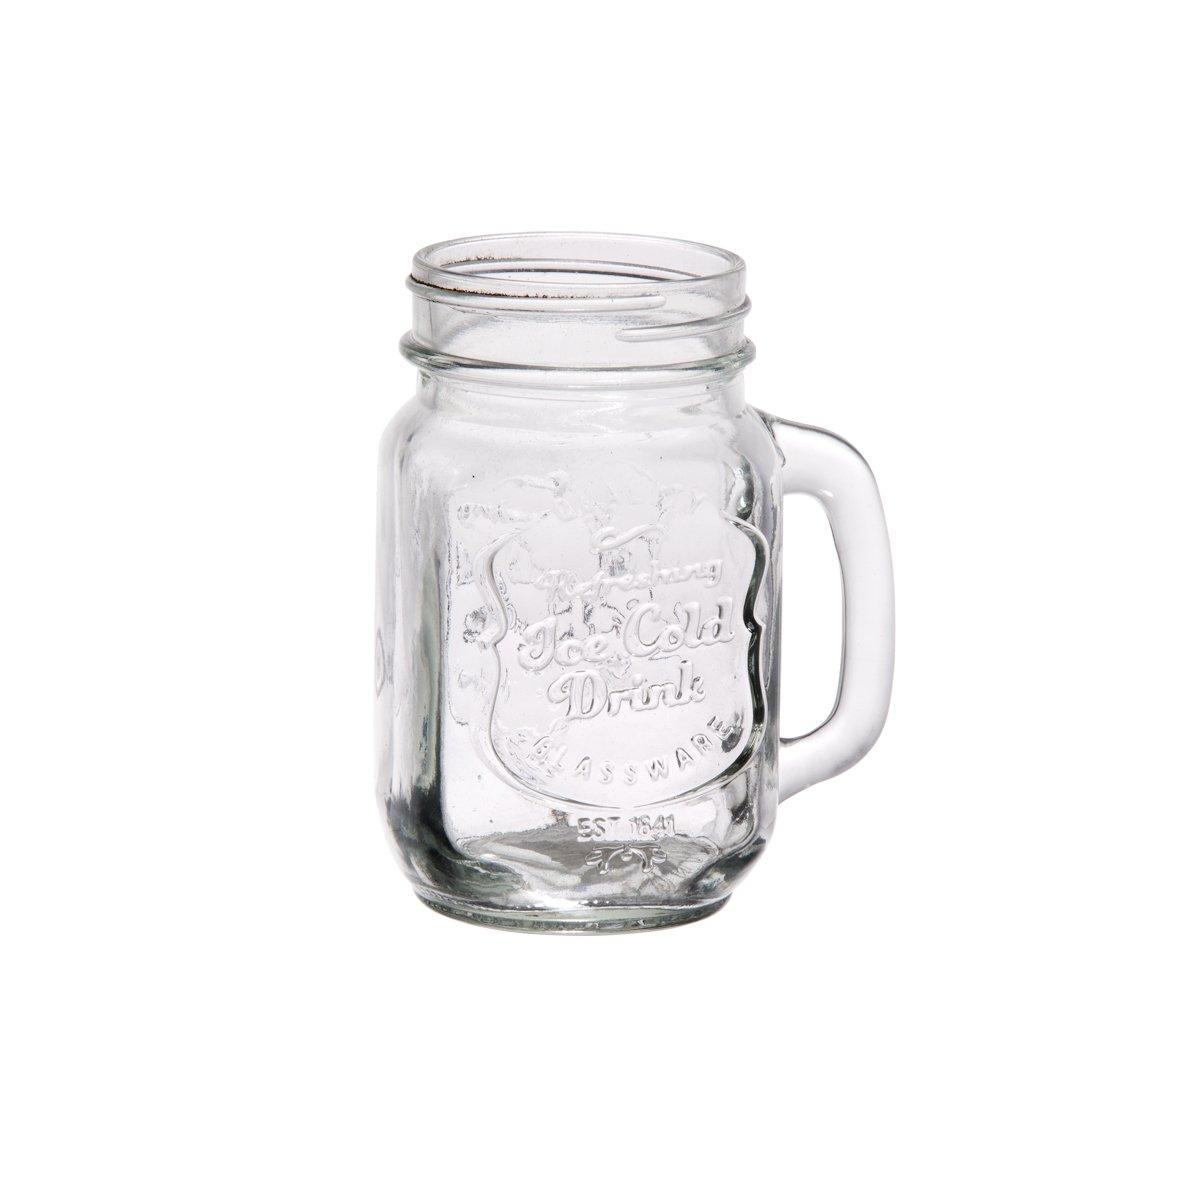 Palais Glassware Mason Jar Tumbler Mug with Handle - 16 Ounces - Set of 4 ('Quality Beverages' Embossed)